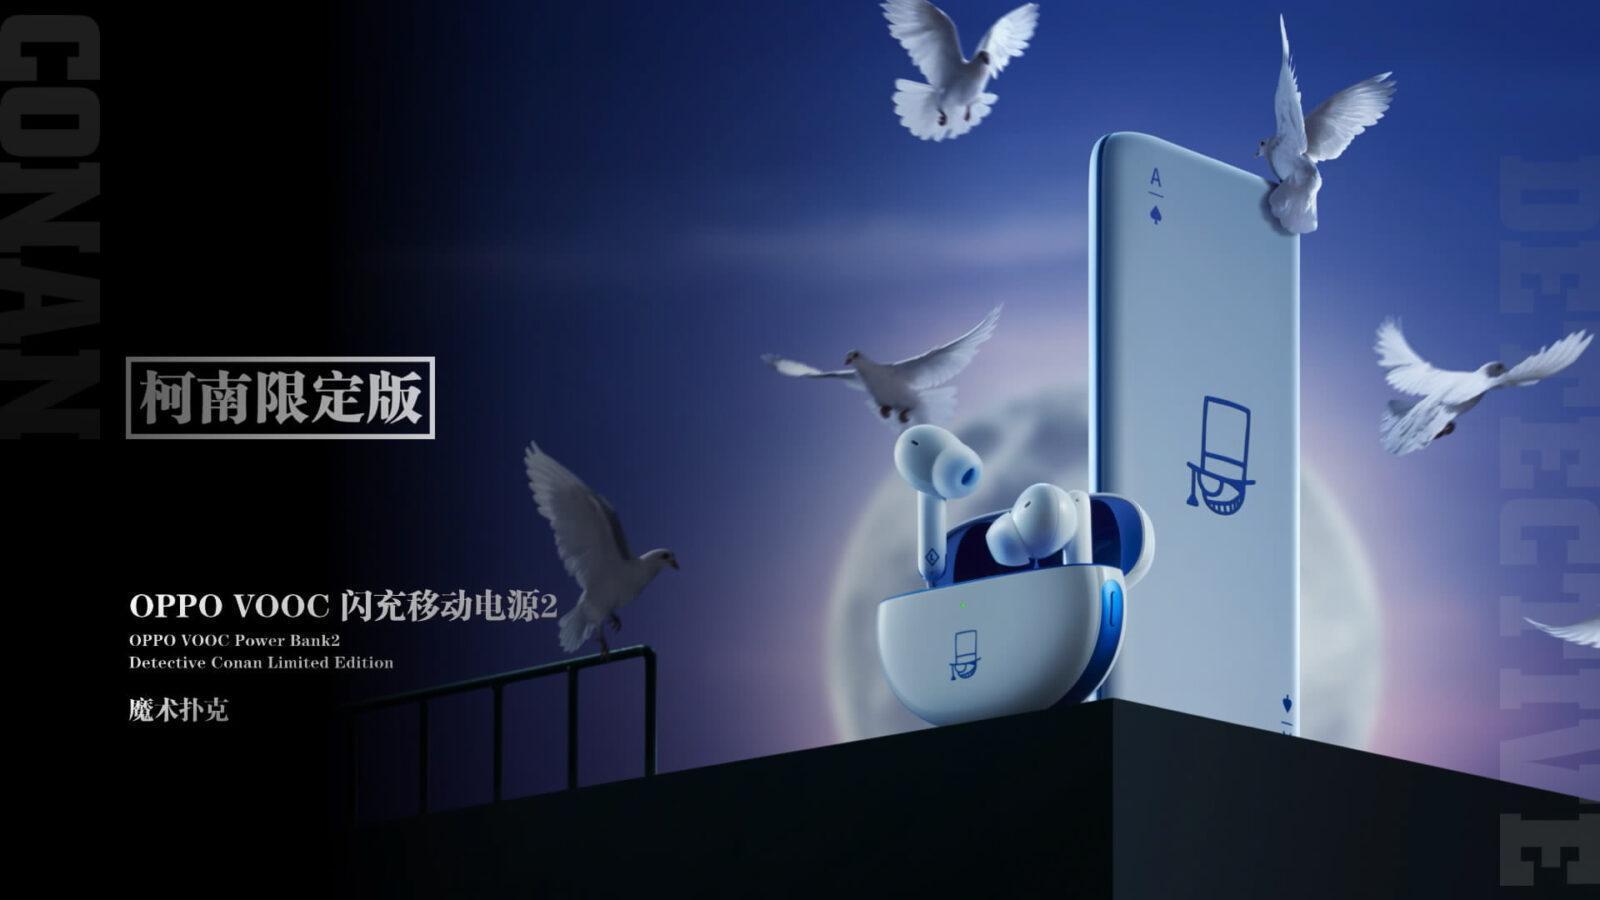 OPPO показала новую, эксклюзивную версию смартфона Reno6 Pro+ (oppo power bank earbuds detective conan)